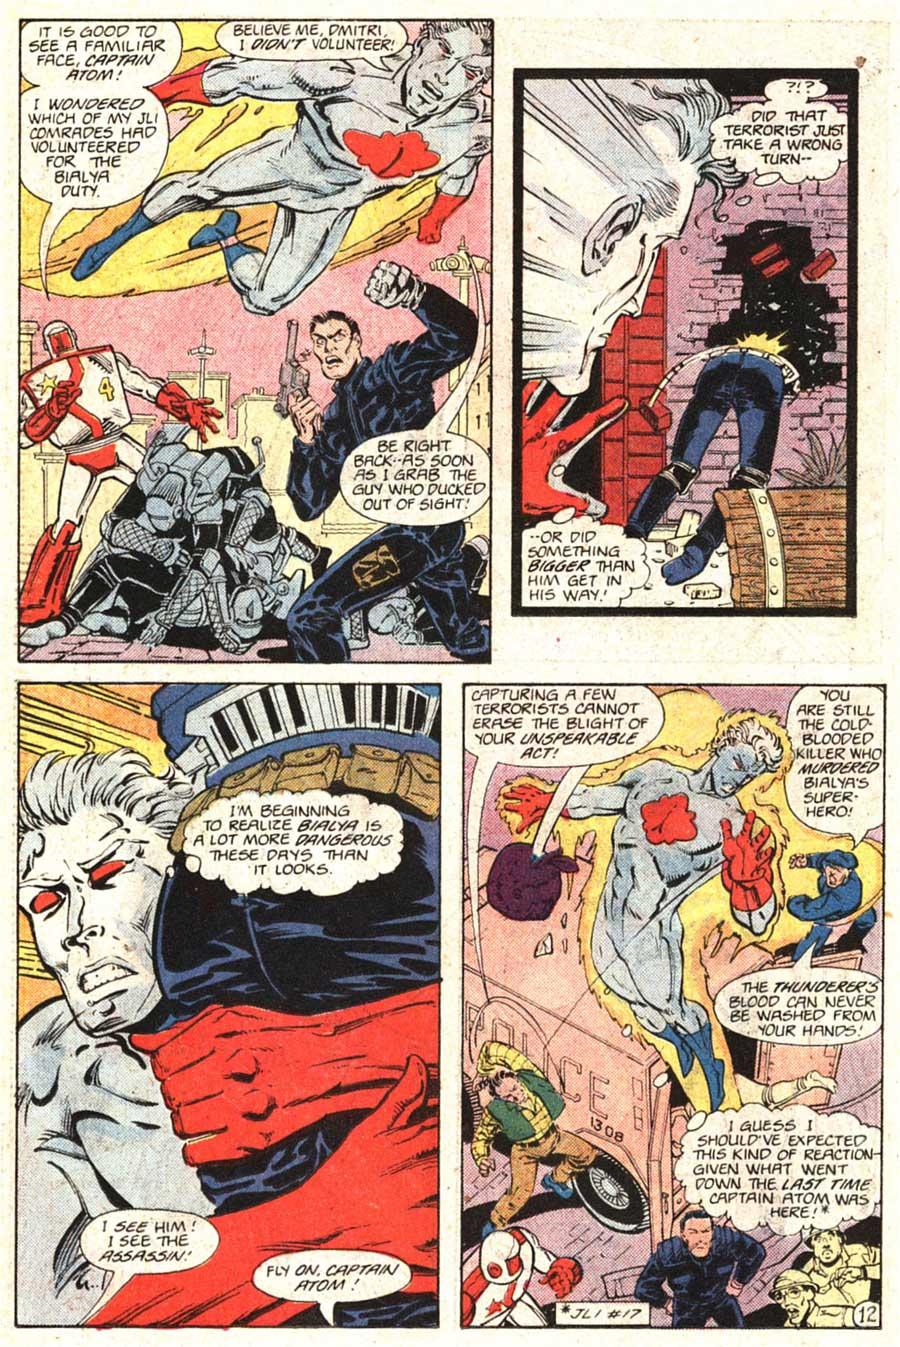 Captain Atom Annual #2 by Cary Bates, Greg Weisman, Paris Cullins & Bob Smith